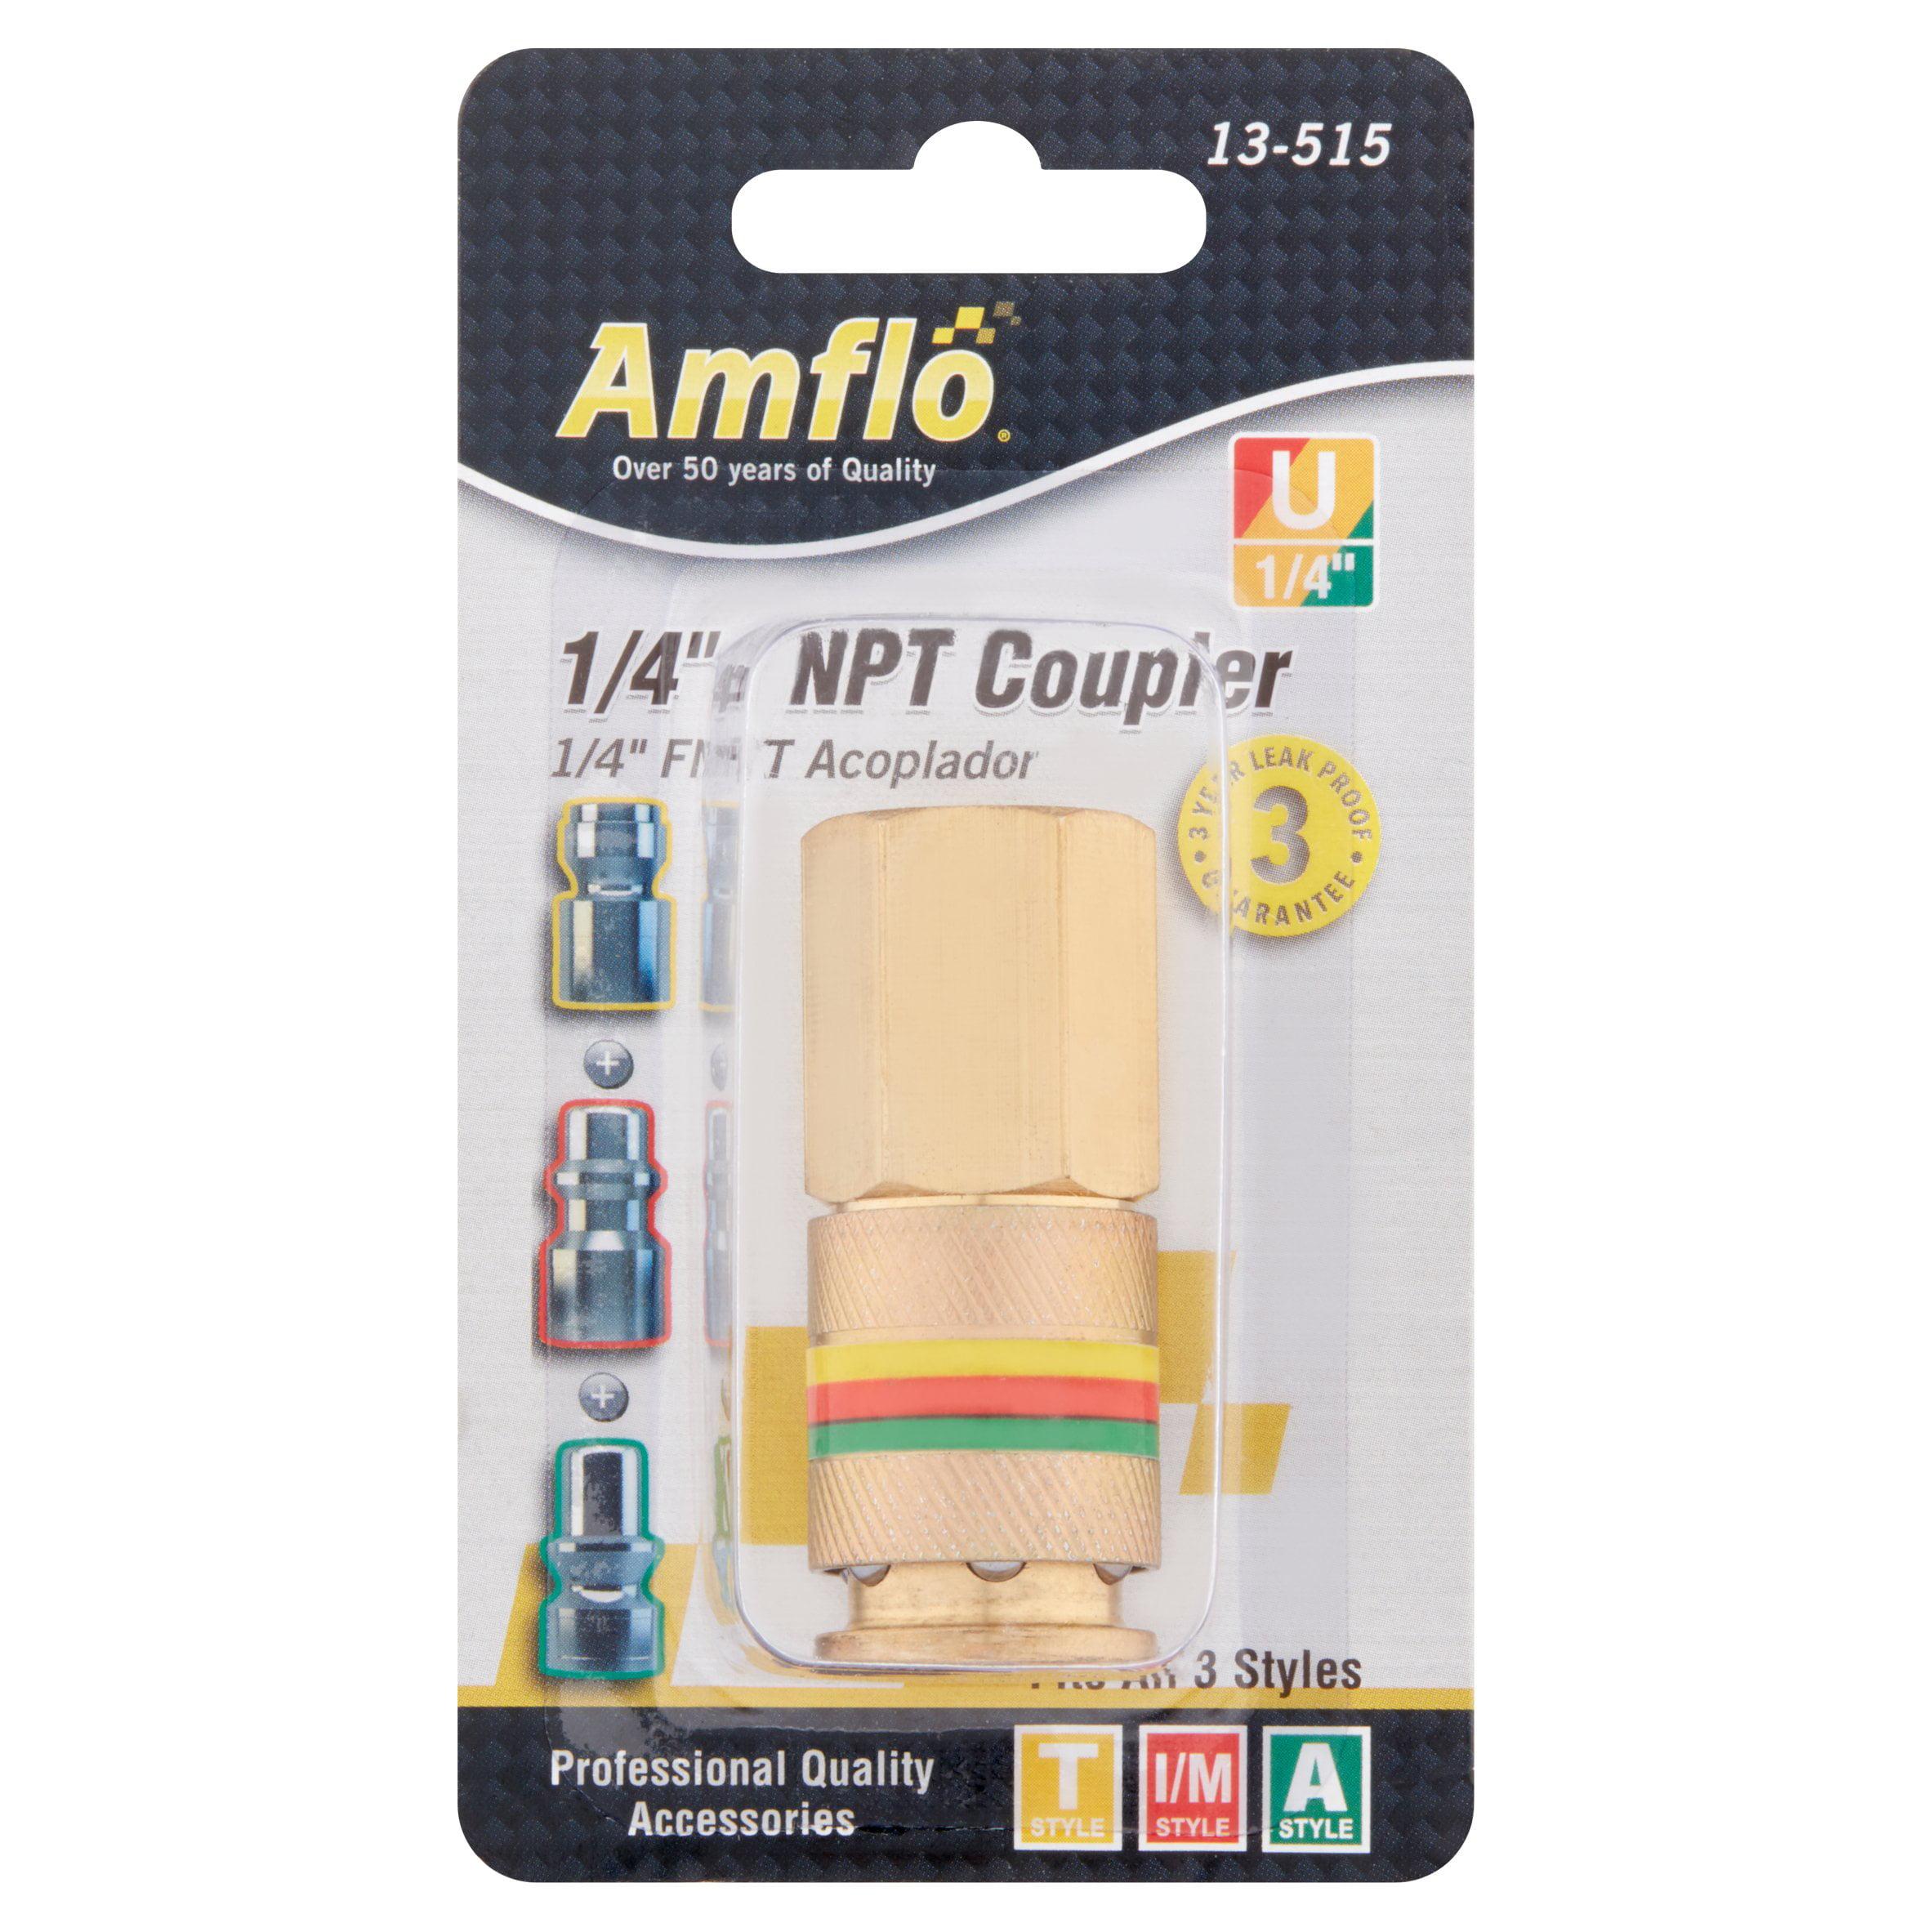 Amflo 1 4'' FNPT Universal Coupler 13-515 by Plews & Edelmann